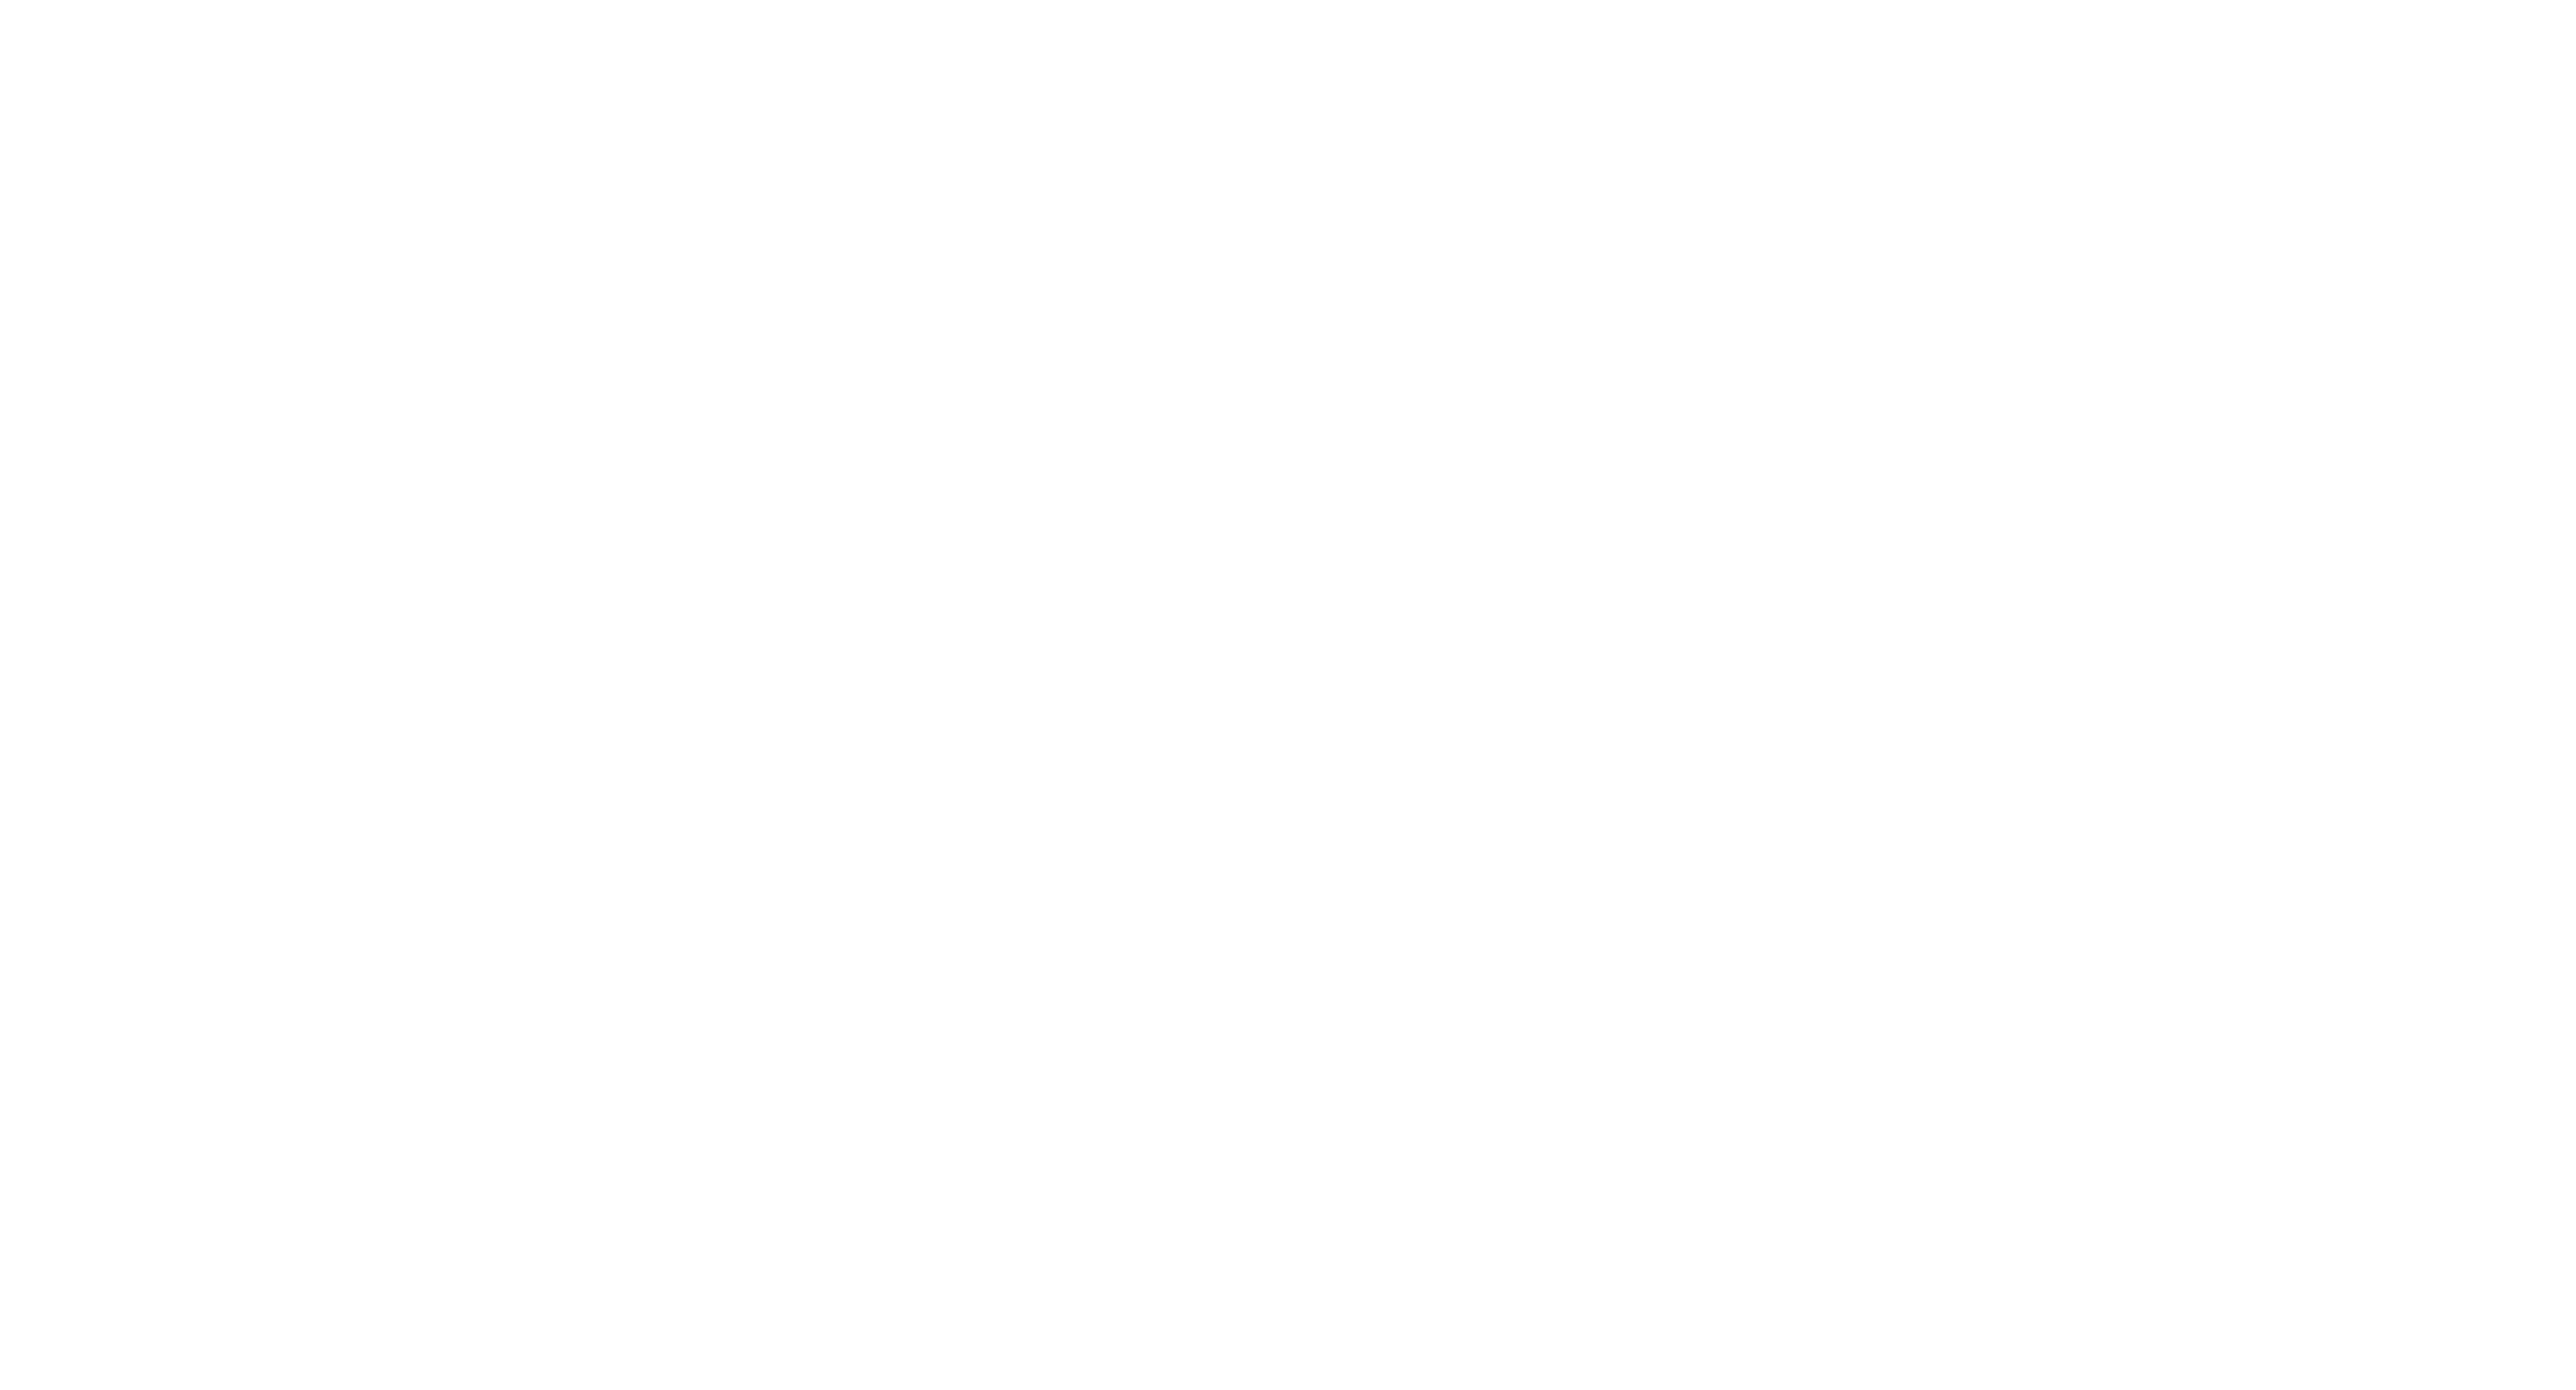 BEYOND BMORE